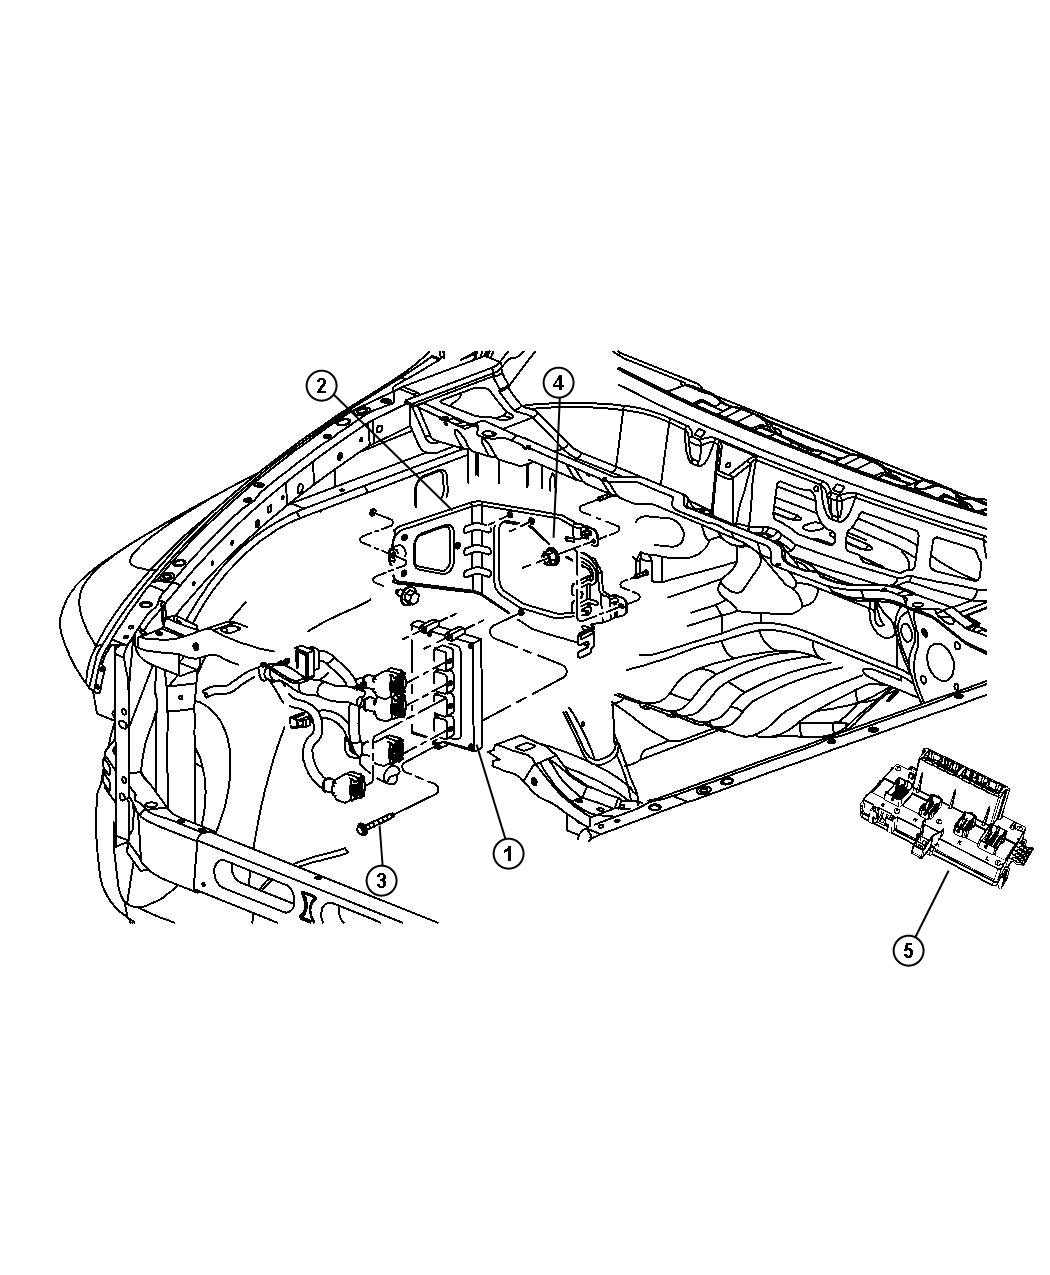 2011 Dodge Ram 1500 Bracket. Powertrain control module